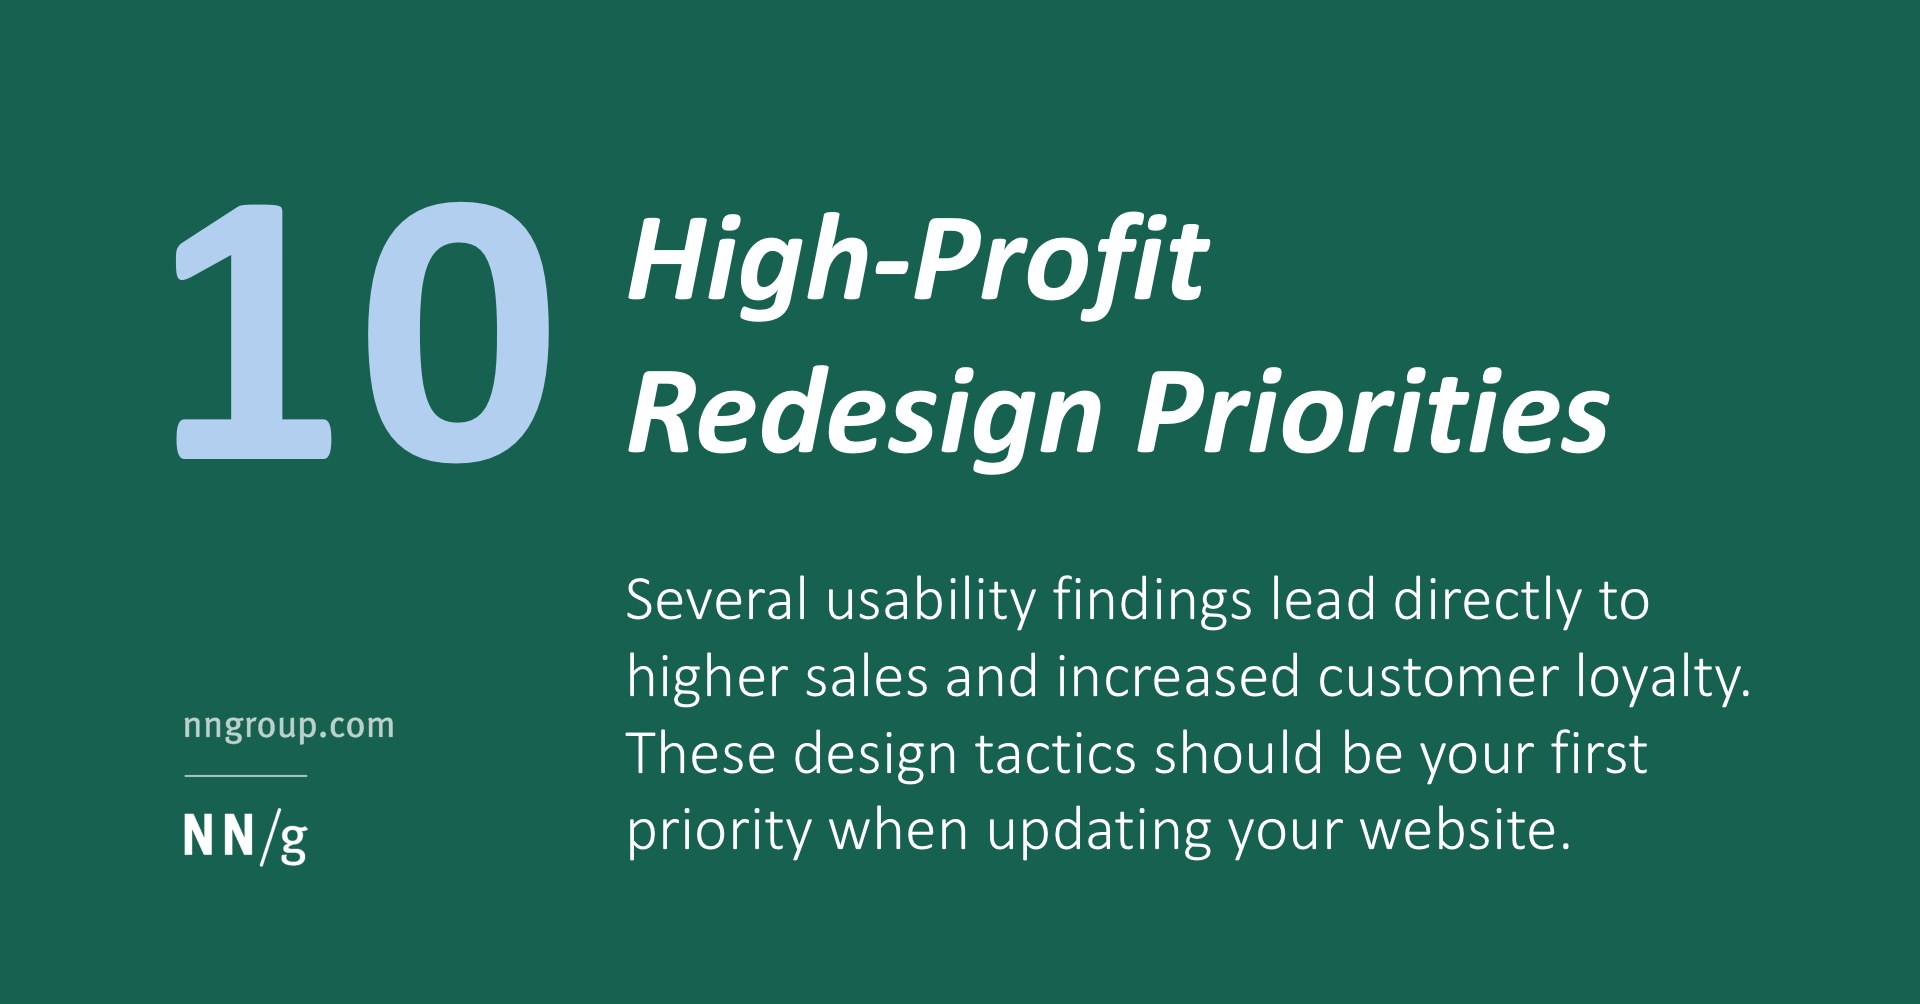 10 High-Profit Redesign Priorities